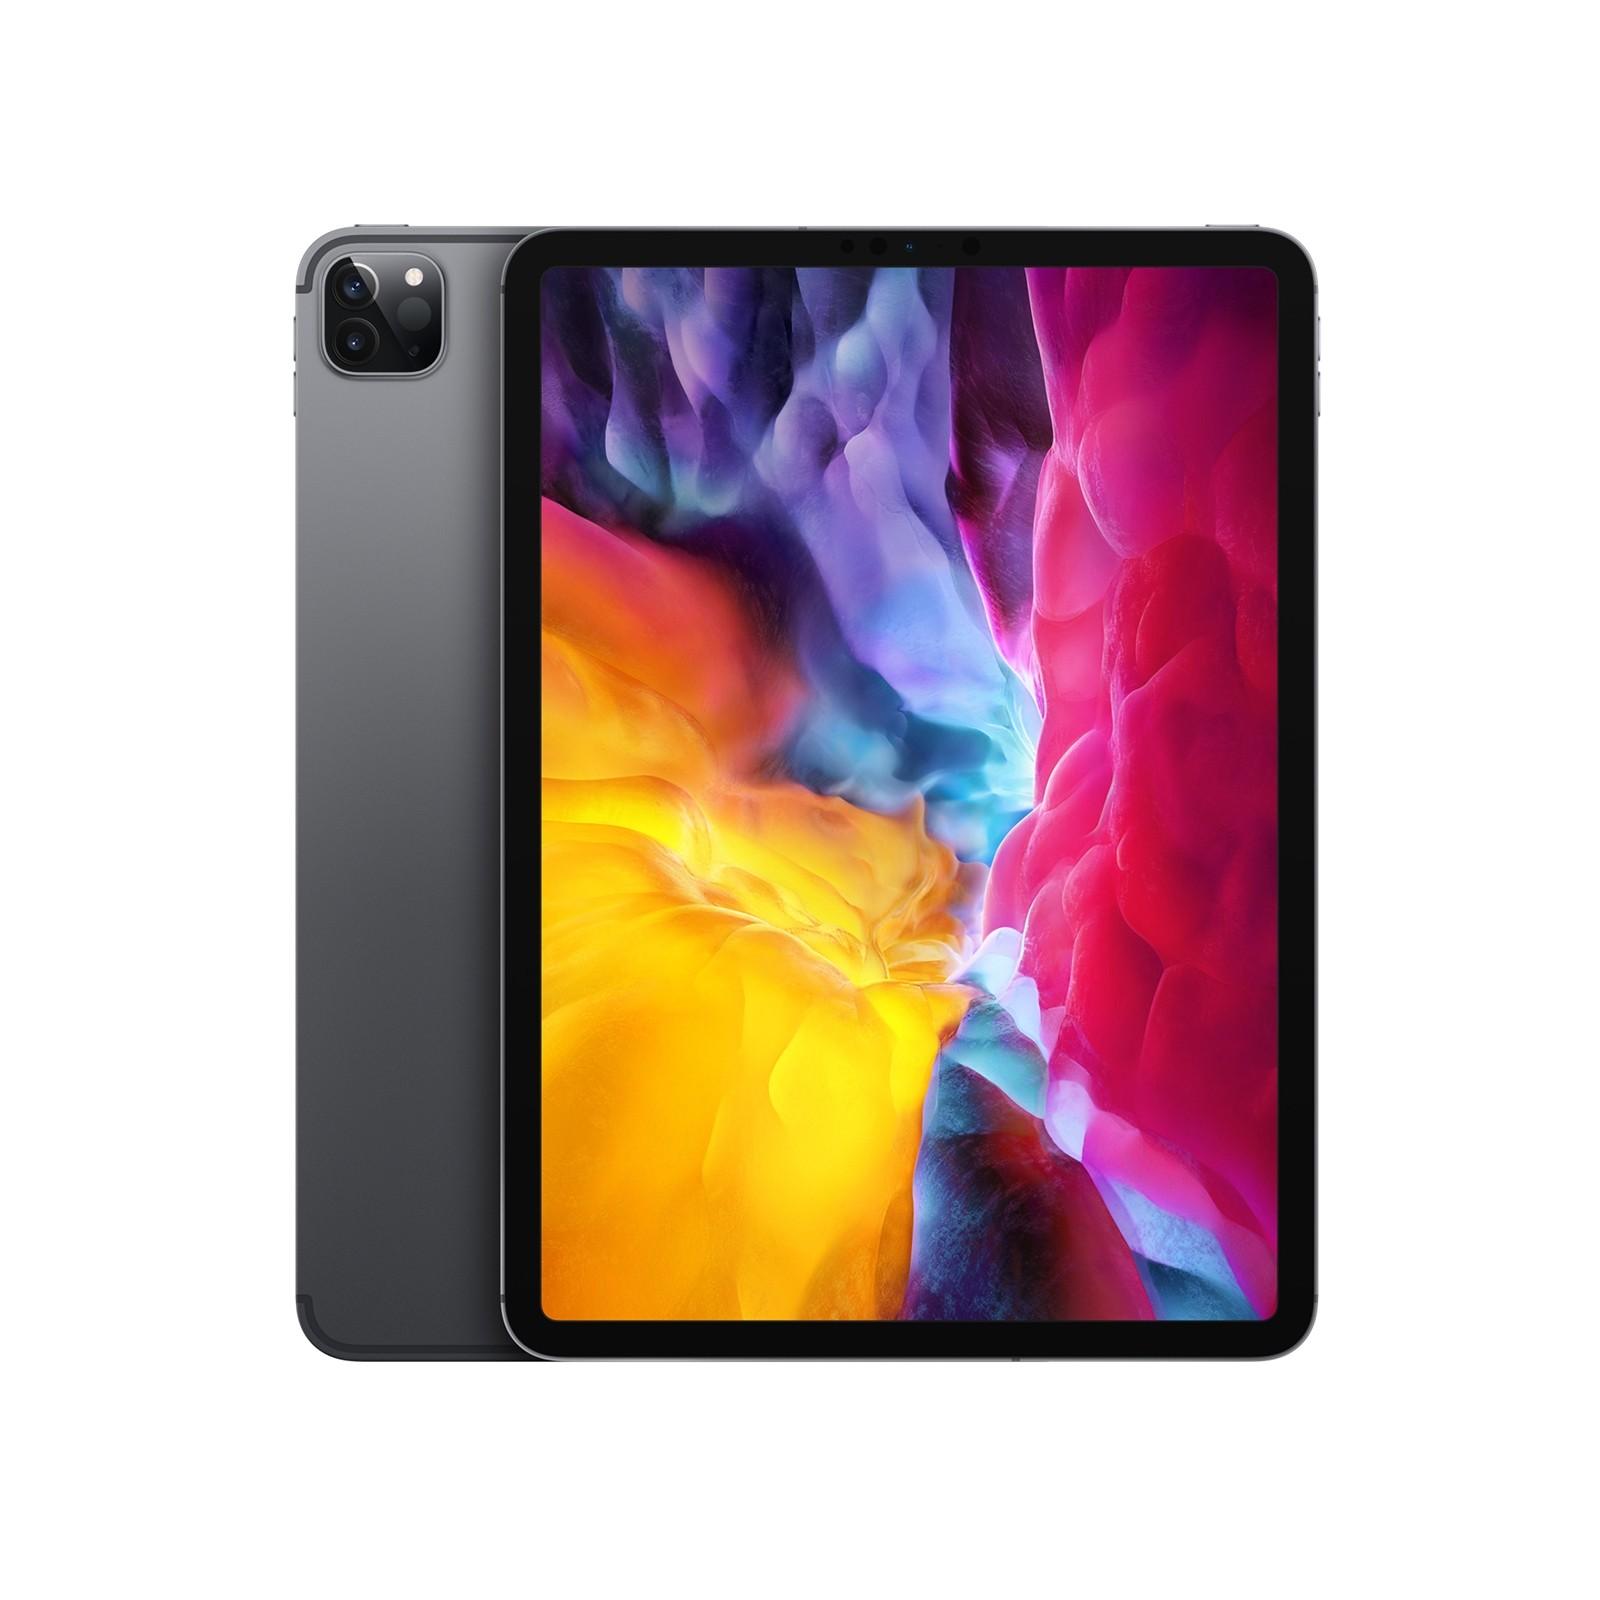 Apple iPad Pro 11inch Wi-Fi + Cellular 1TB - Space Grey